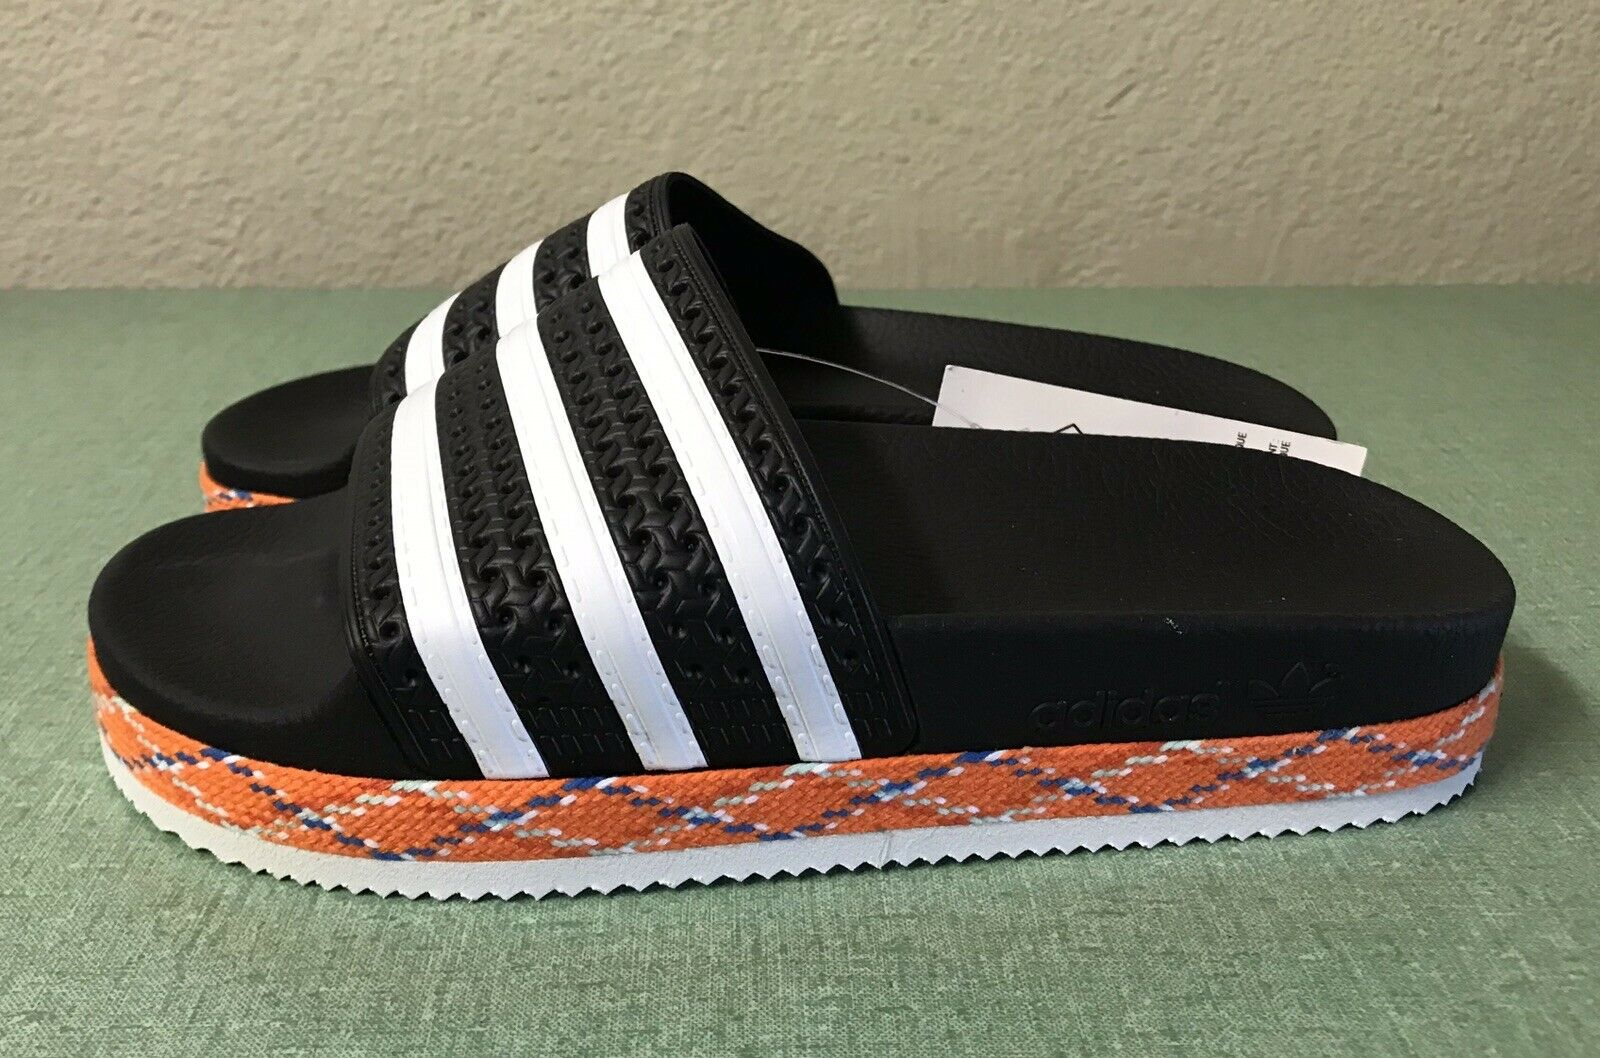 Adidas New Sandals Slides Core Black White Women's Sz 6